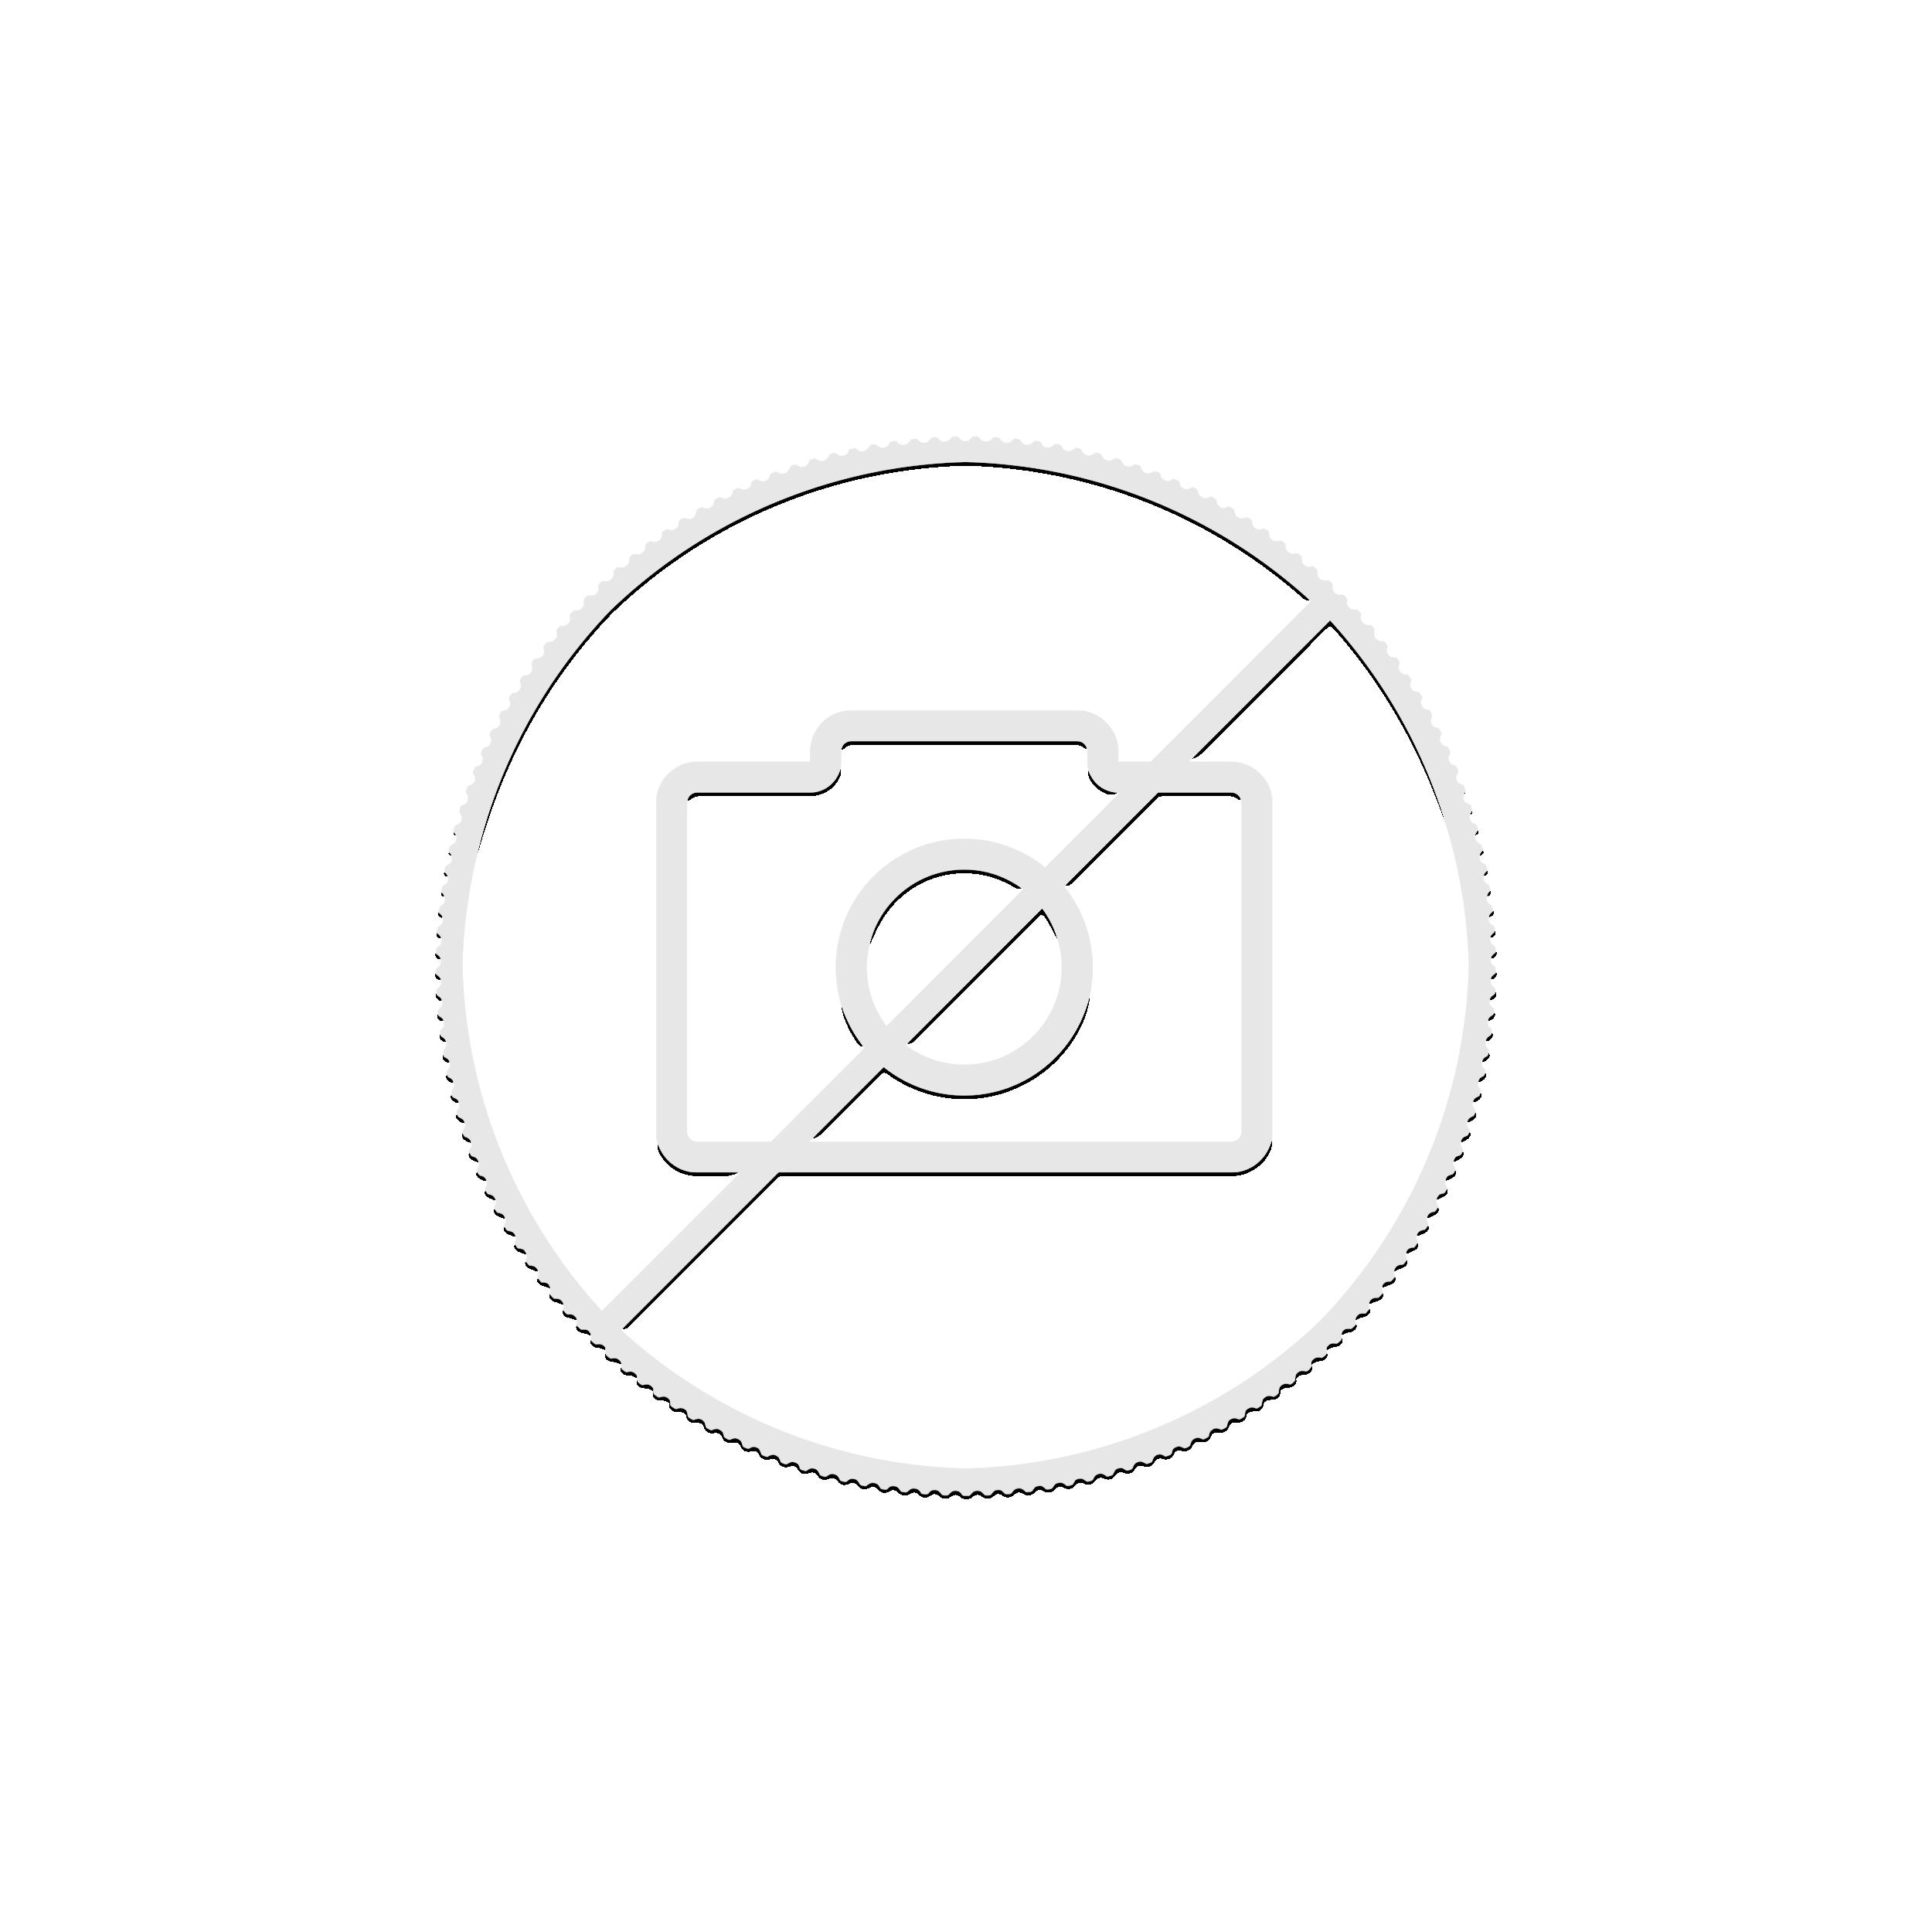 1 troy ounce gouden Lunar munt 2015